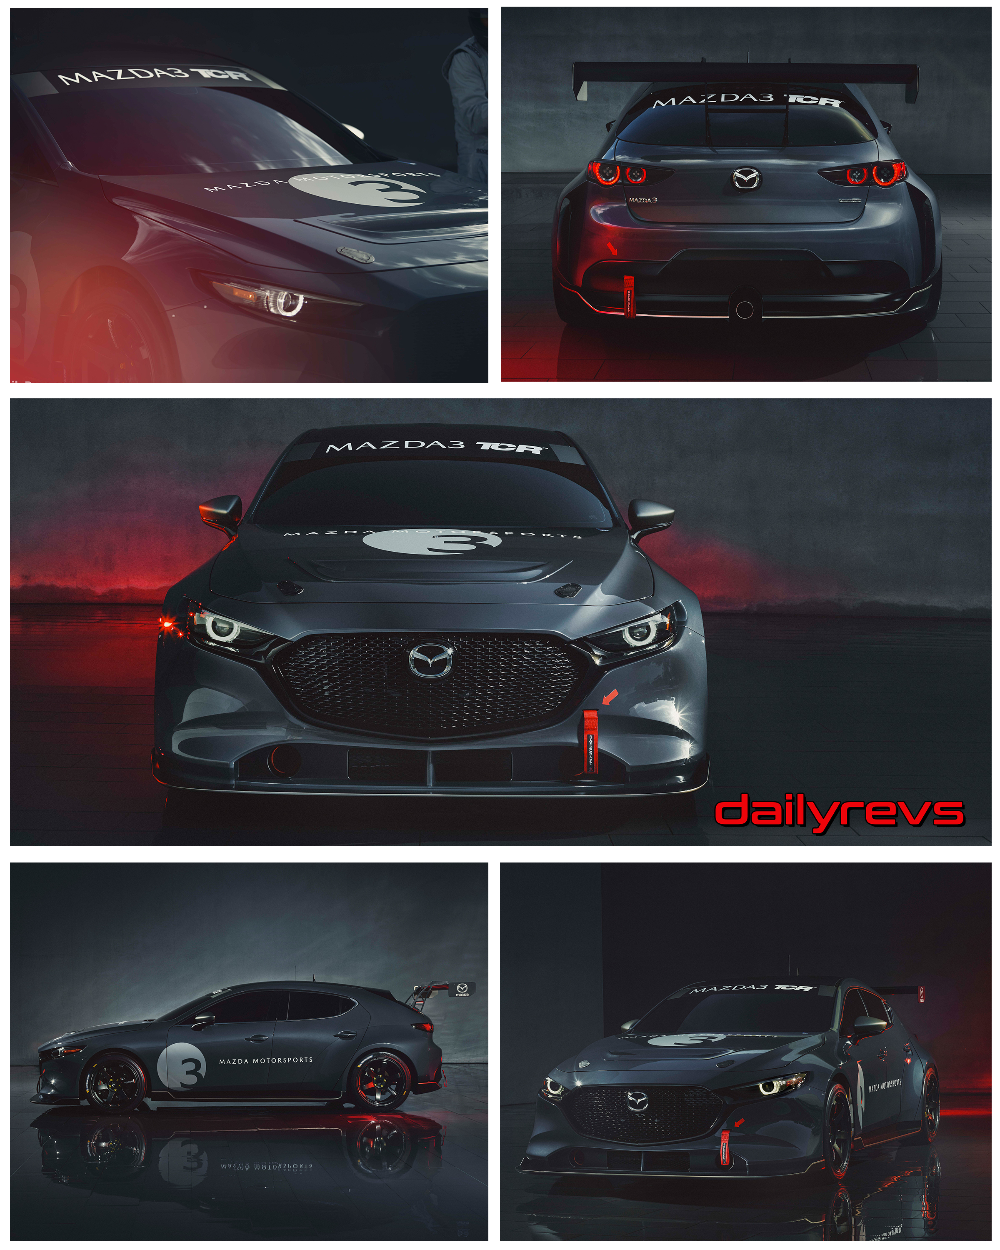 2020 Mazda 3 Tcr Hq Pictures Specs Information And Videos Mazda Mazda 3 Sportscar